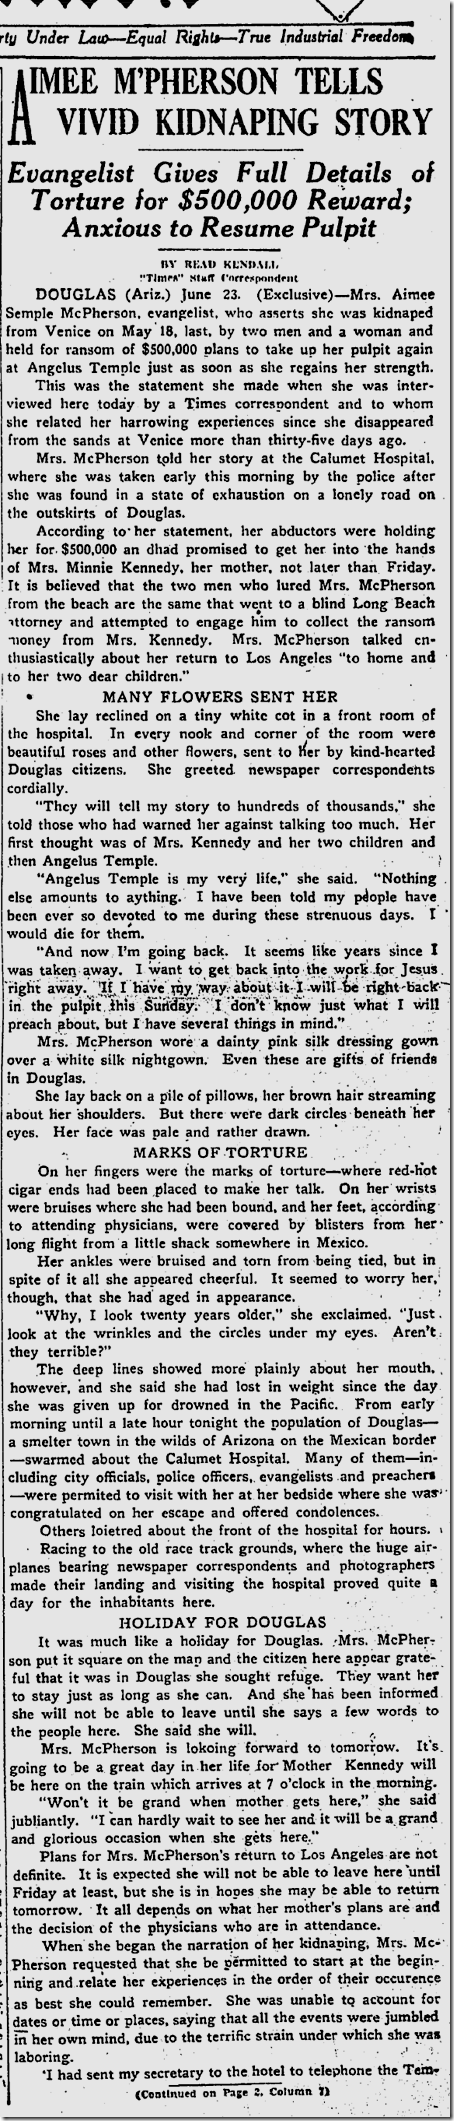 June 24, 1926, Aimee Semple McPherson